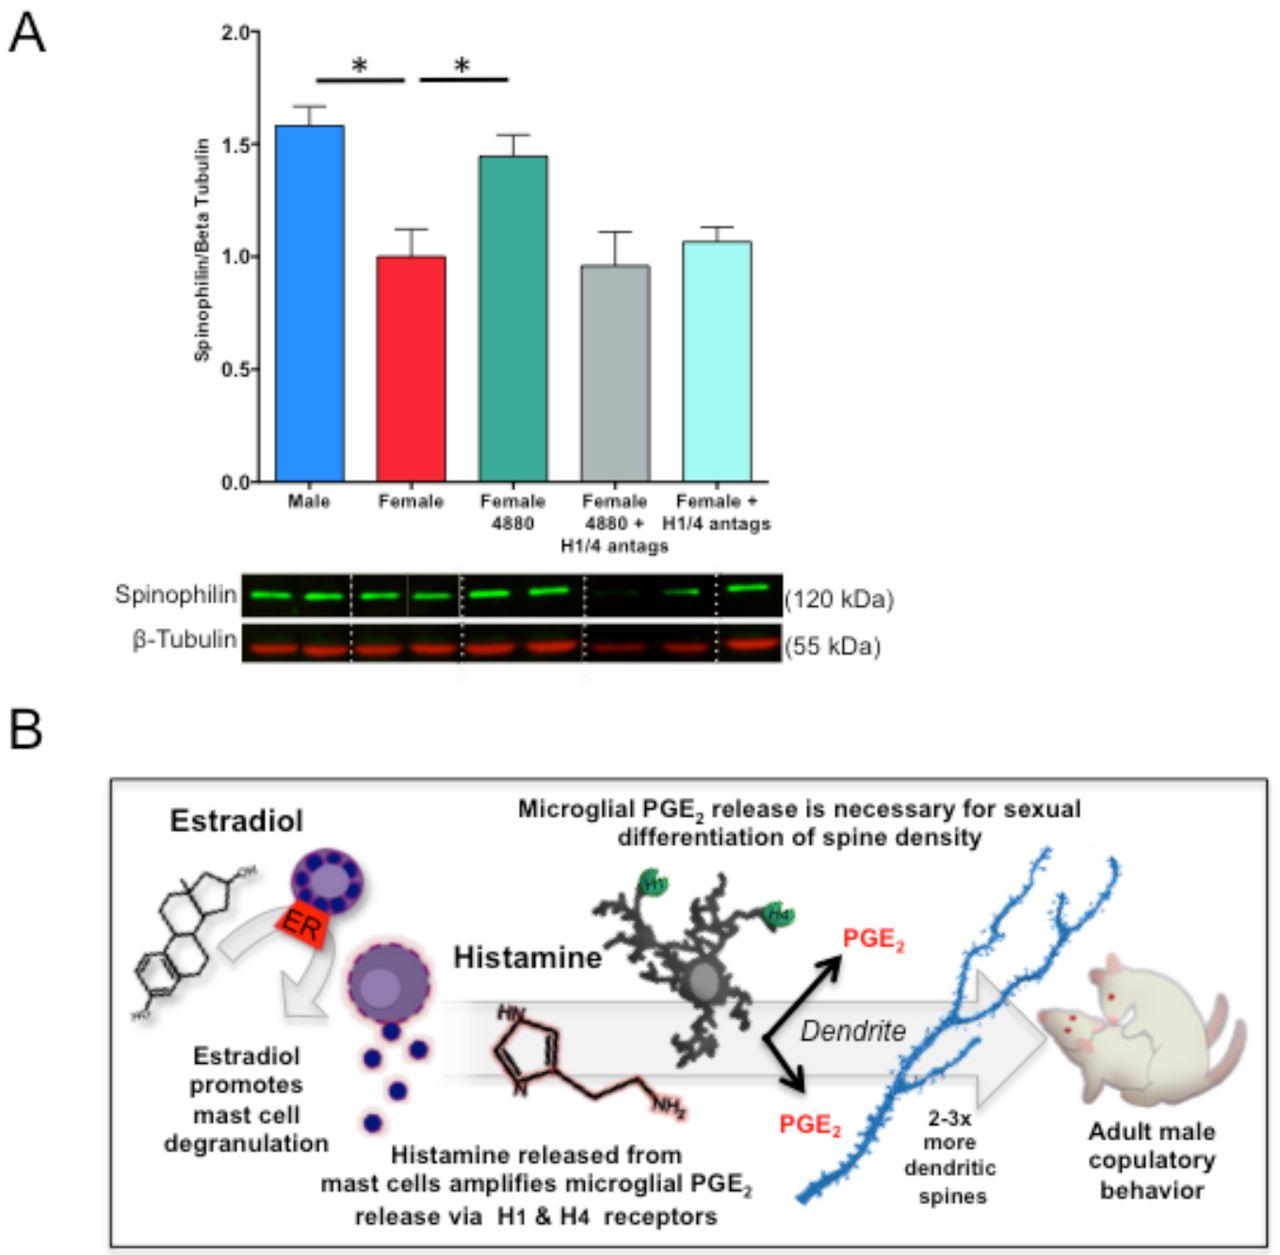 Mast Cells in the Developing Brain Determine Adult Sexual Behavior